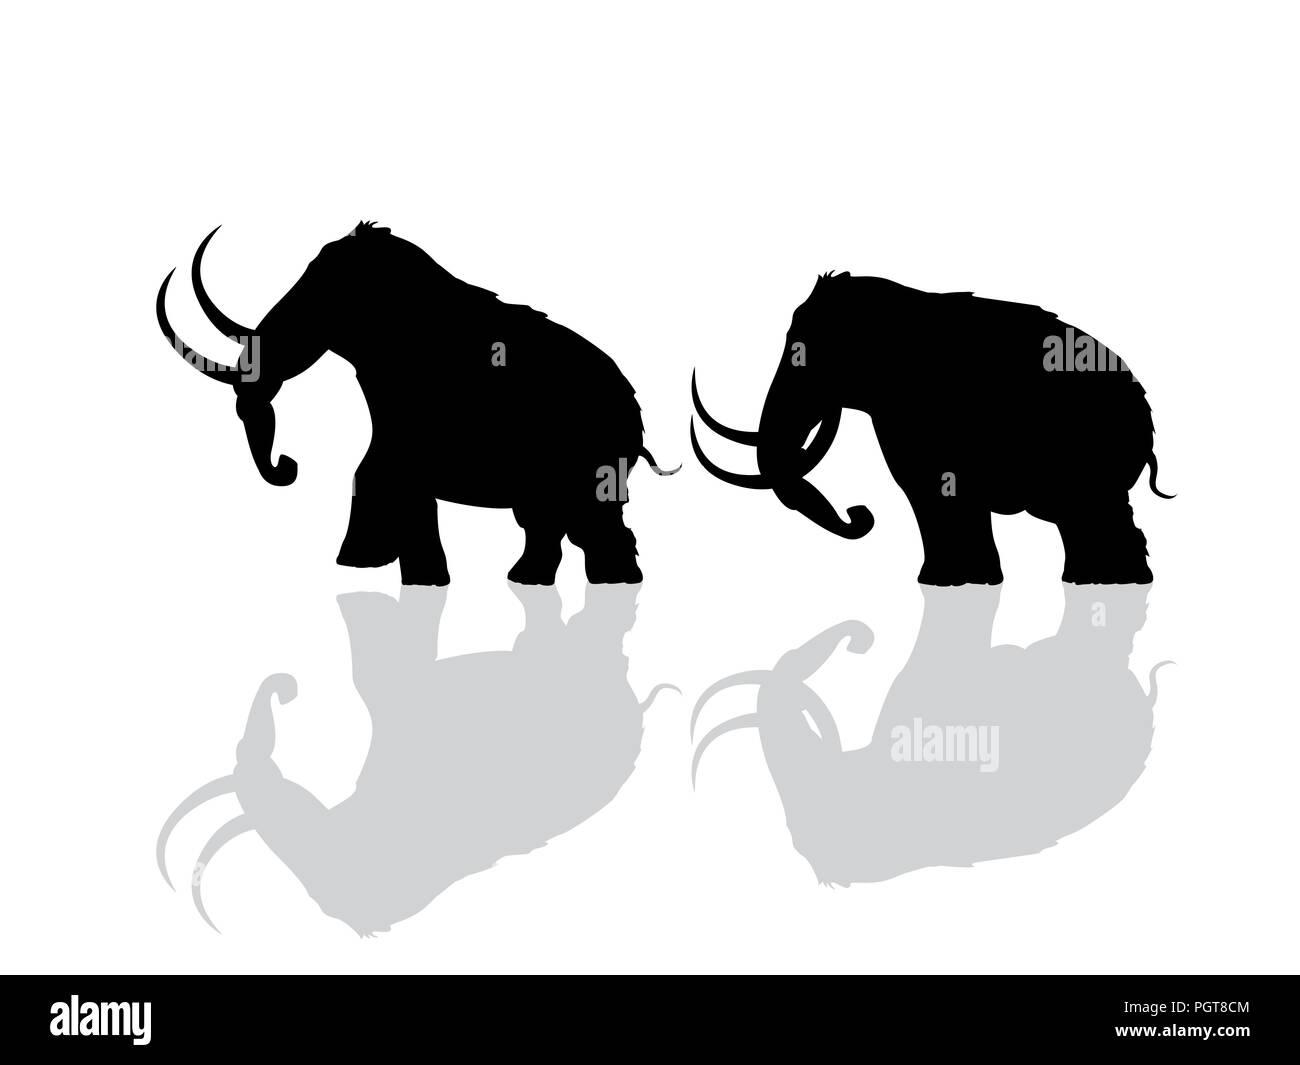 Mammoth Bones Stock Photos & Mammoth Bones Stock Images - Alamy